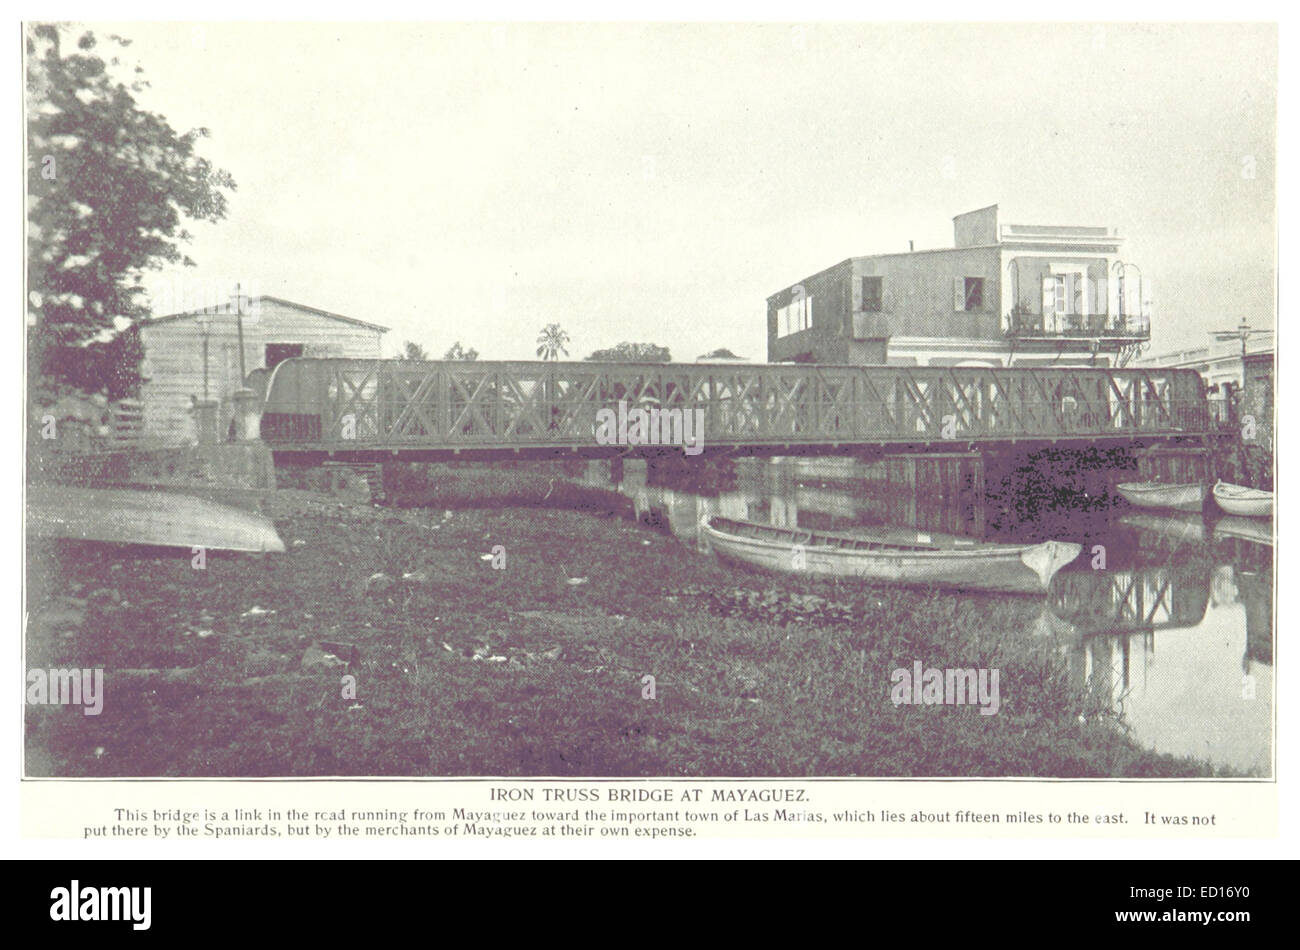 Mayaguez, Iron Truss Bridge - Stock Image